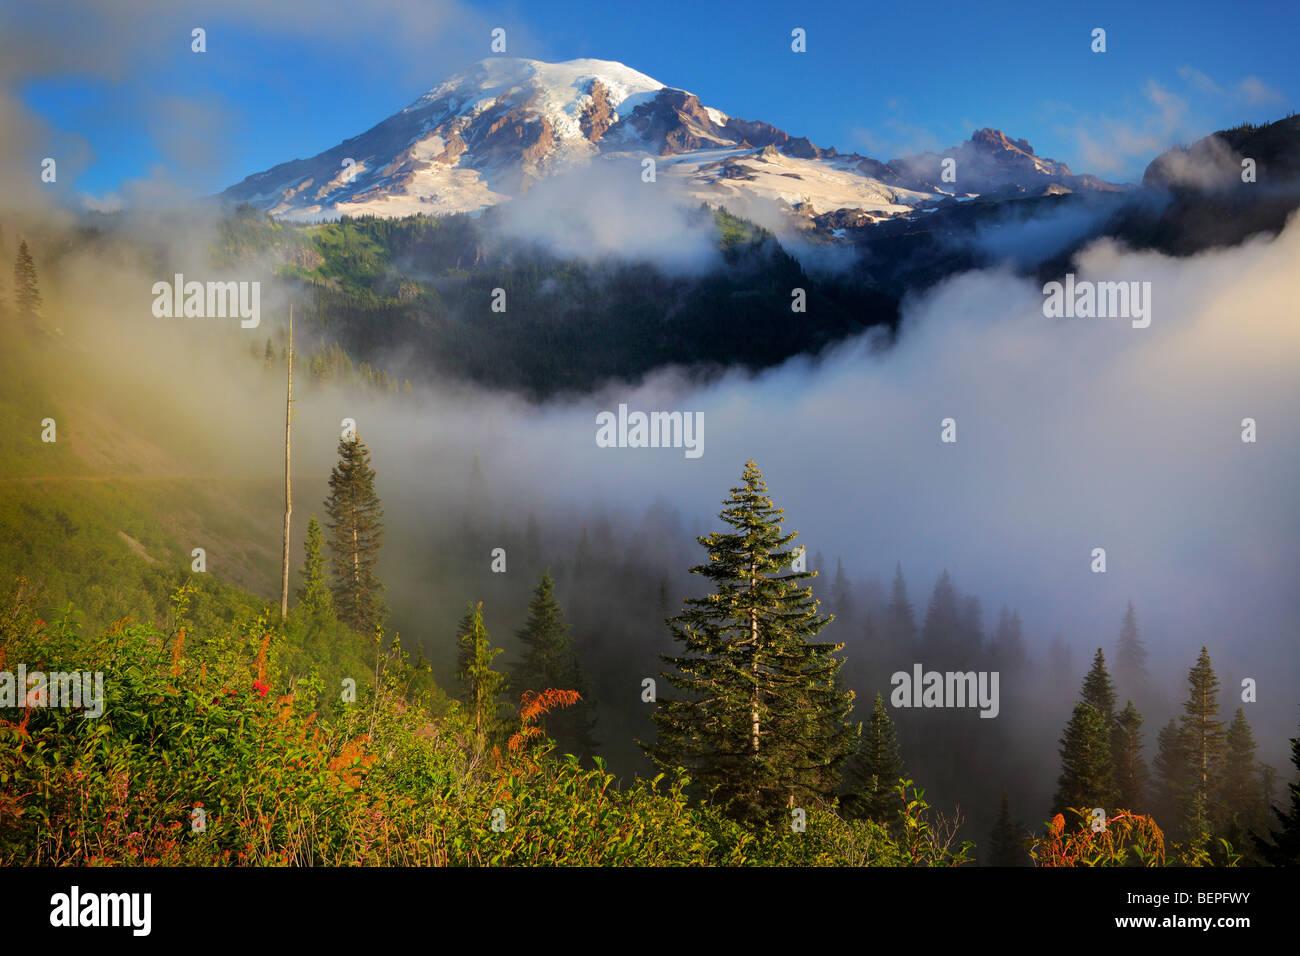 Mount Rainier in the fog - Stock Image